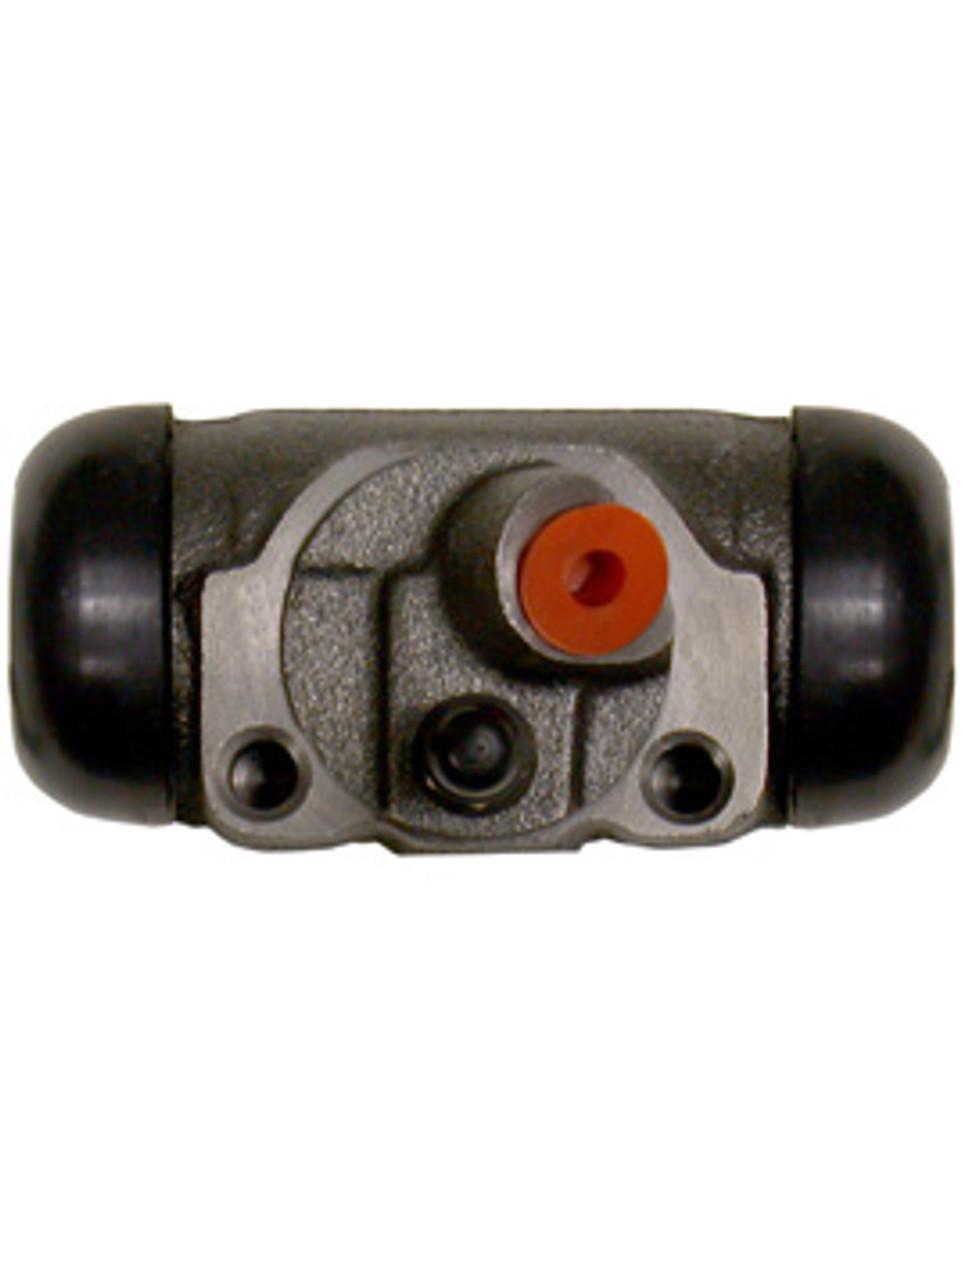 "17186 --- Wheel Cylinder Left Hand for Duo-Servo 12"" Hydraulic Brakes"